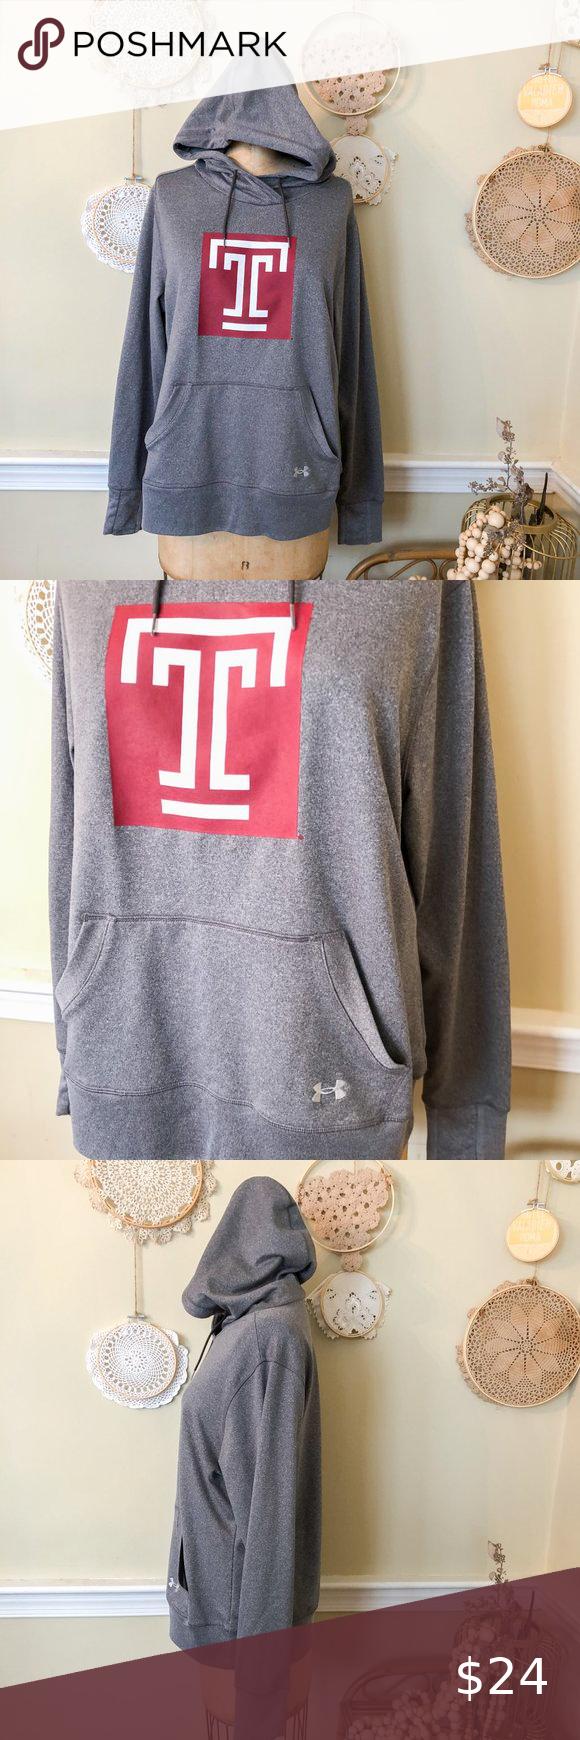 Under Armour Temple Grey Hoodie Sweatshirt M Grey Sweatshirt Hoodie Grey Hoodie Sweatshirts Hoodie [ 1740 x 580 Pixel ]